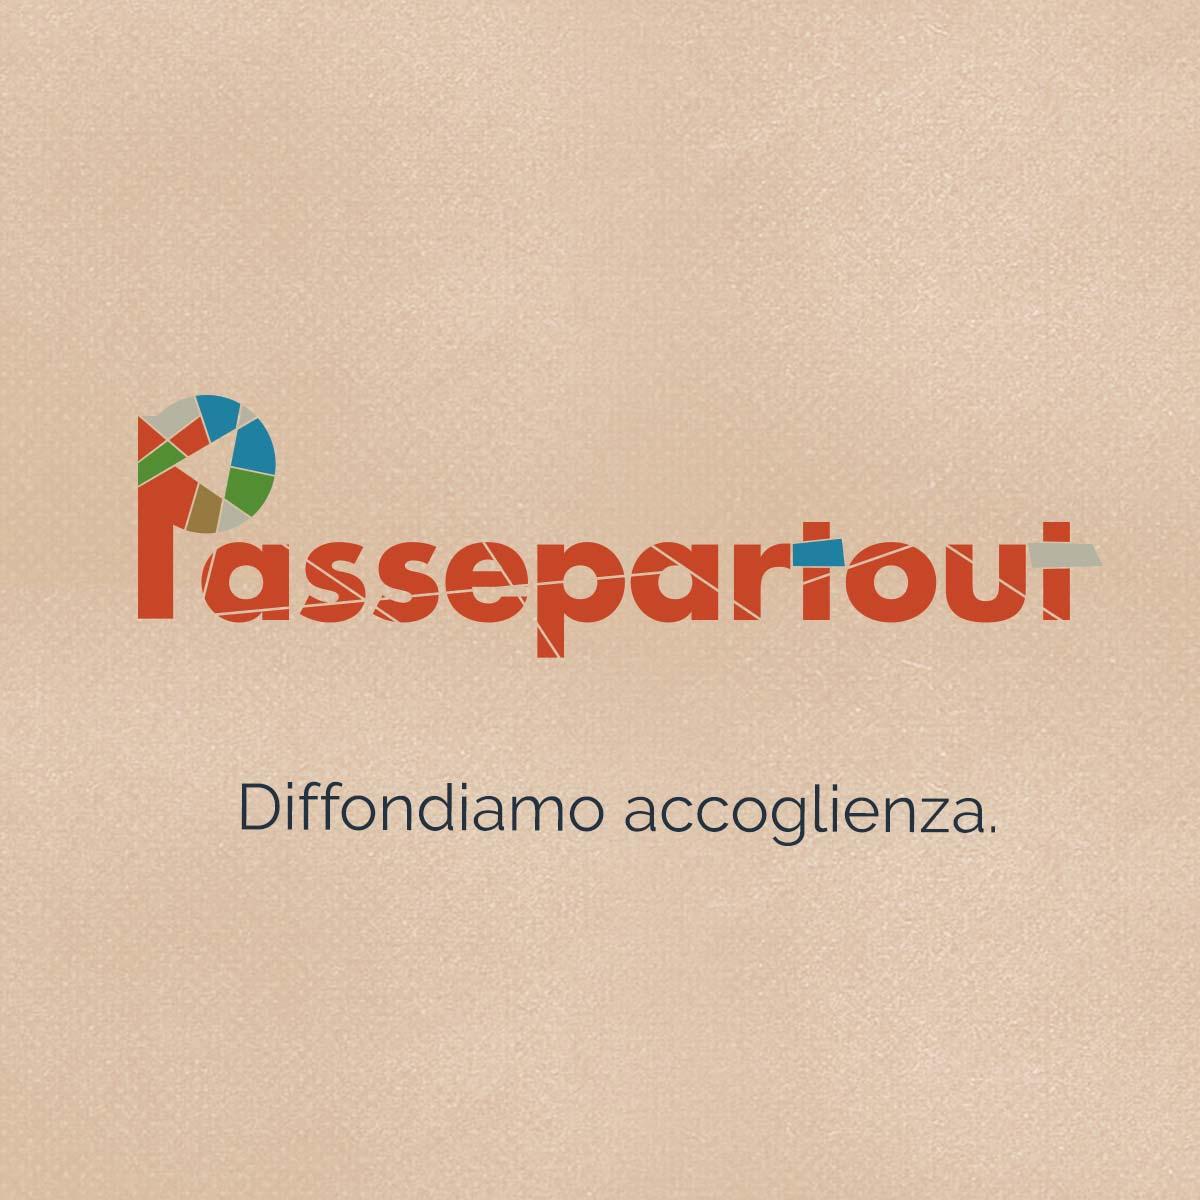 Passepartout_logo